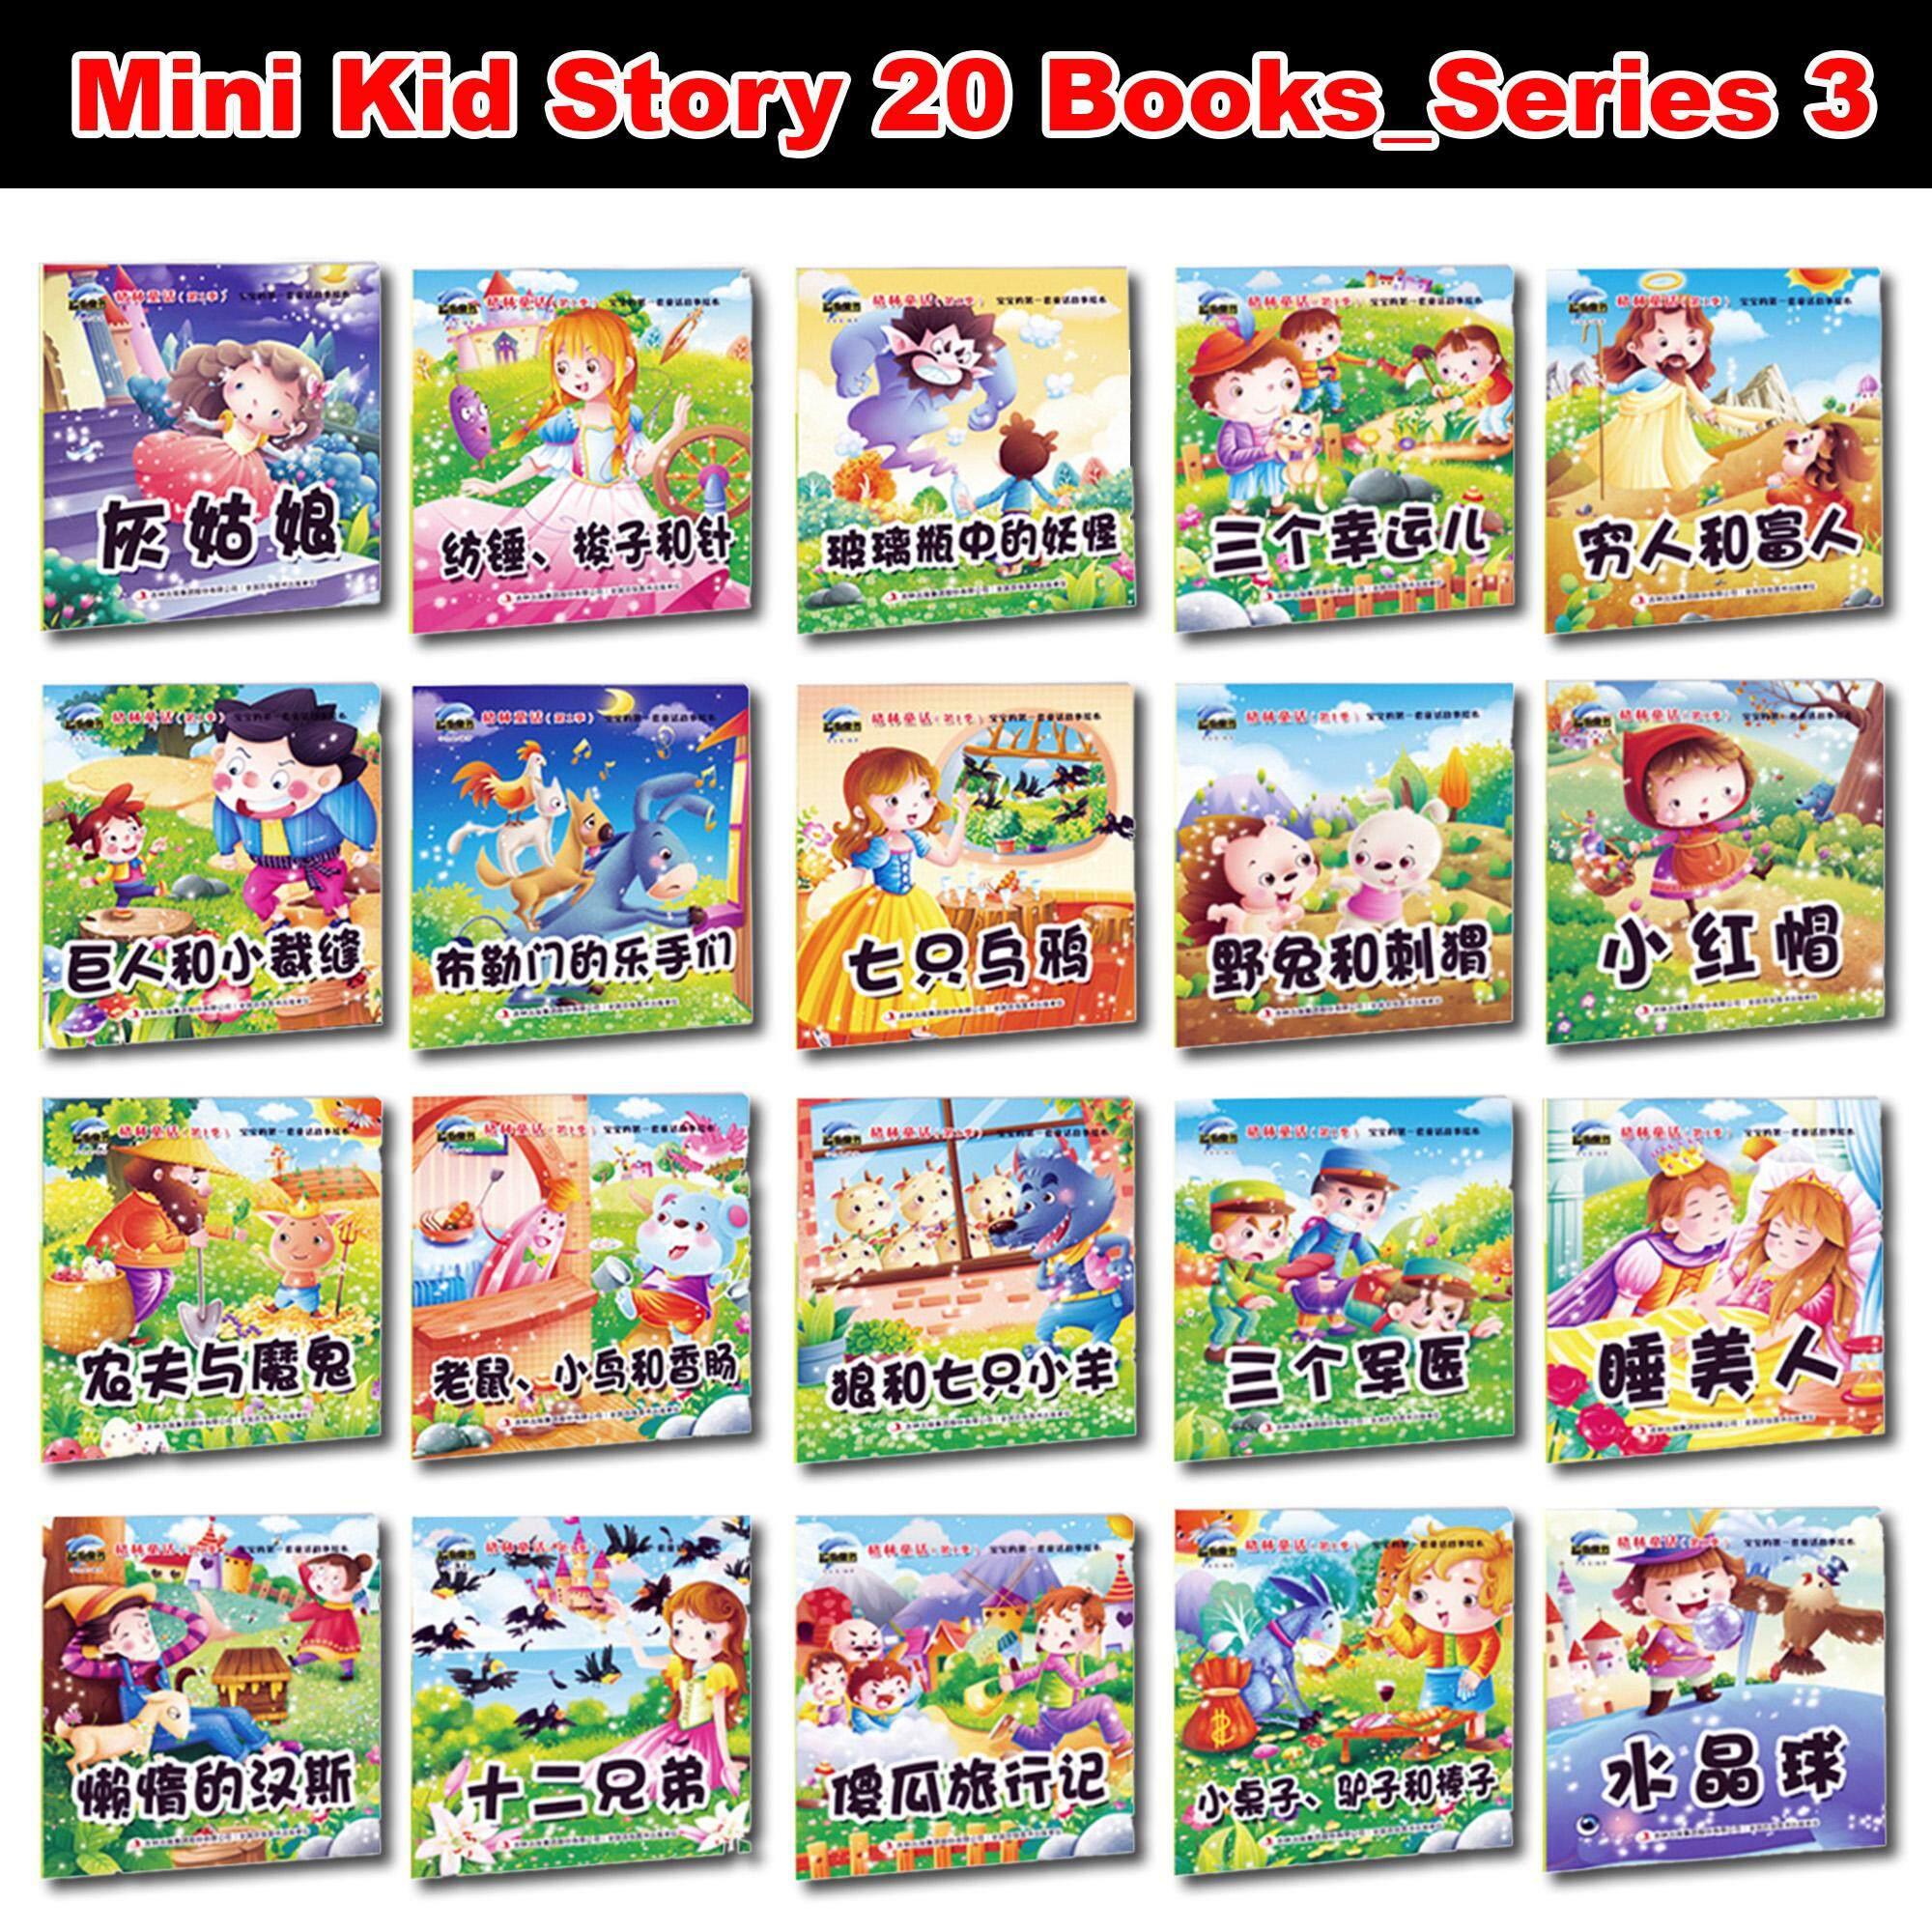 Mini Kids Story 20 Books_Series 3